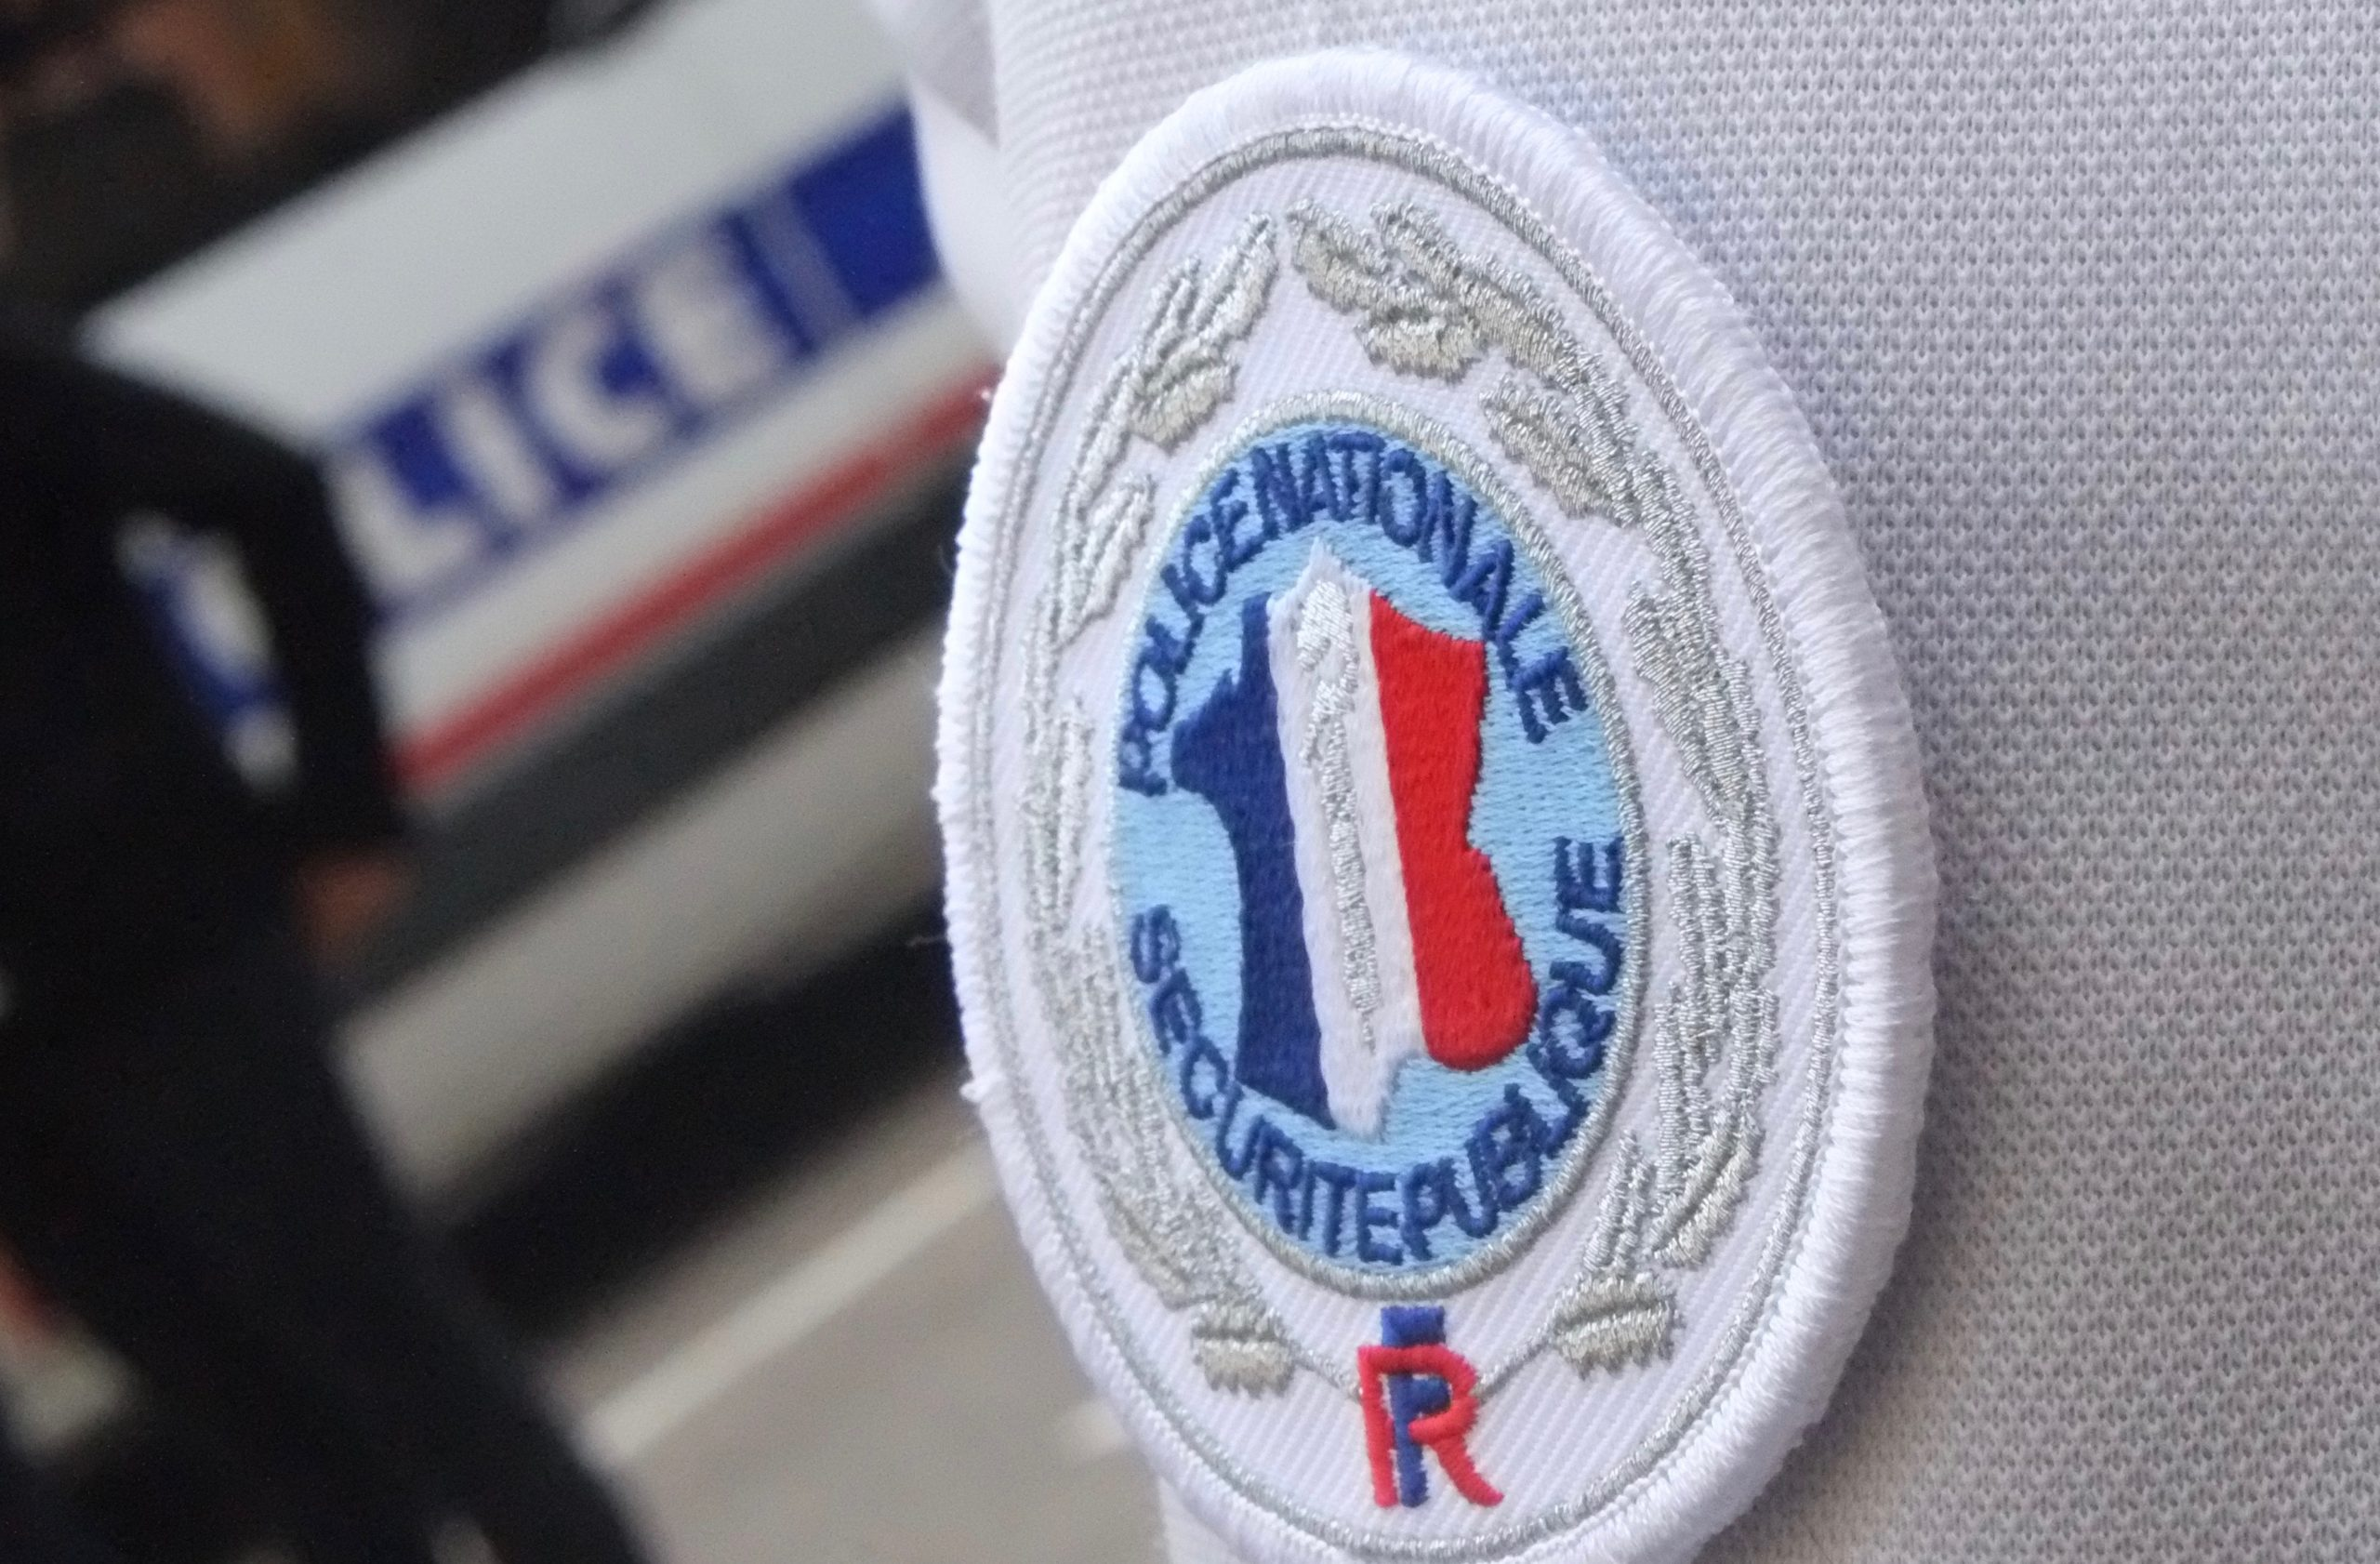 Police 7 (TQ)